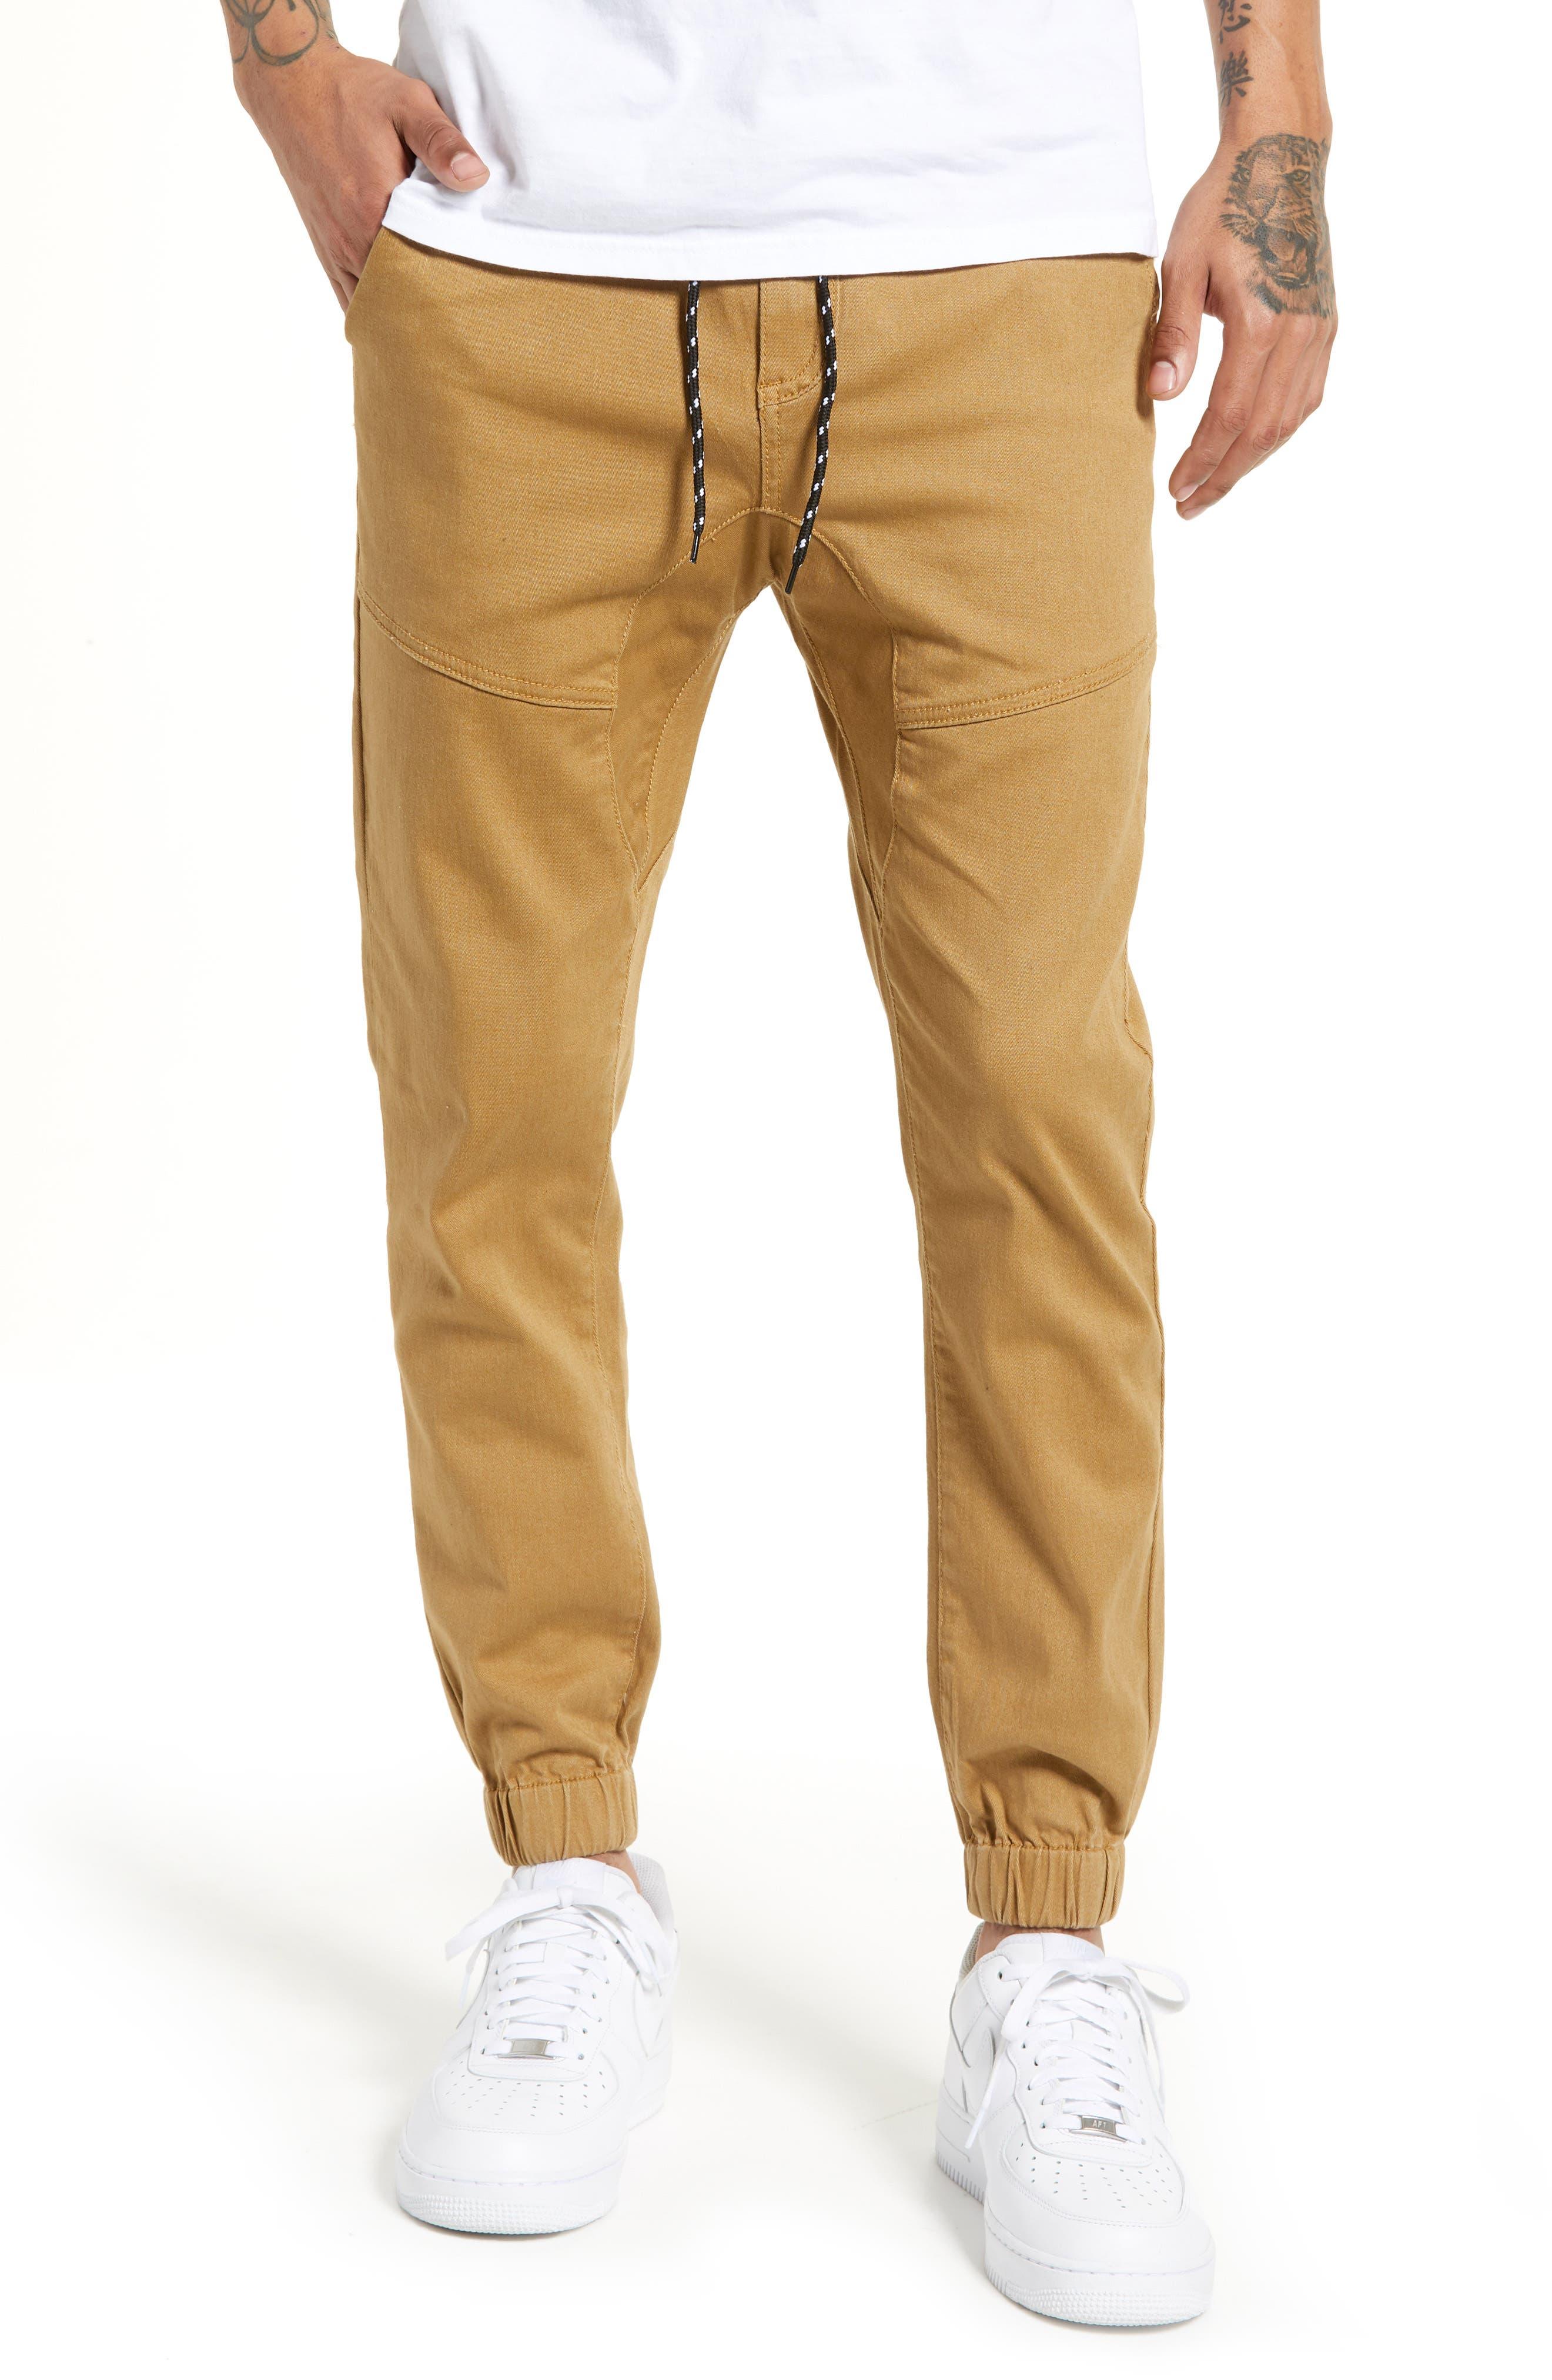 LIRA CLOTHING, Clifton Slim Fit Jogger Pants, Main thumbnail 1, color, 250